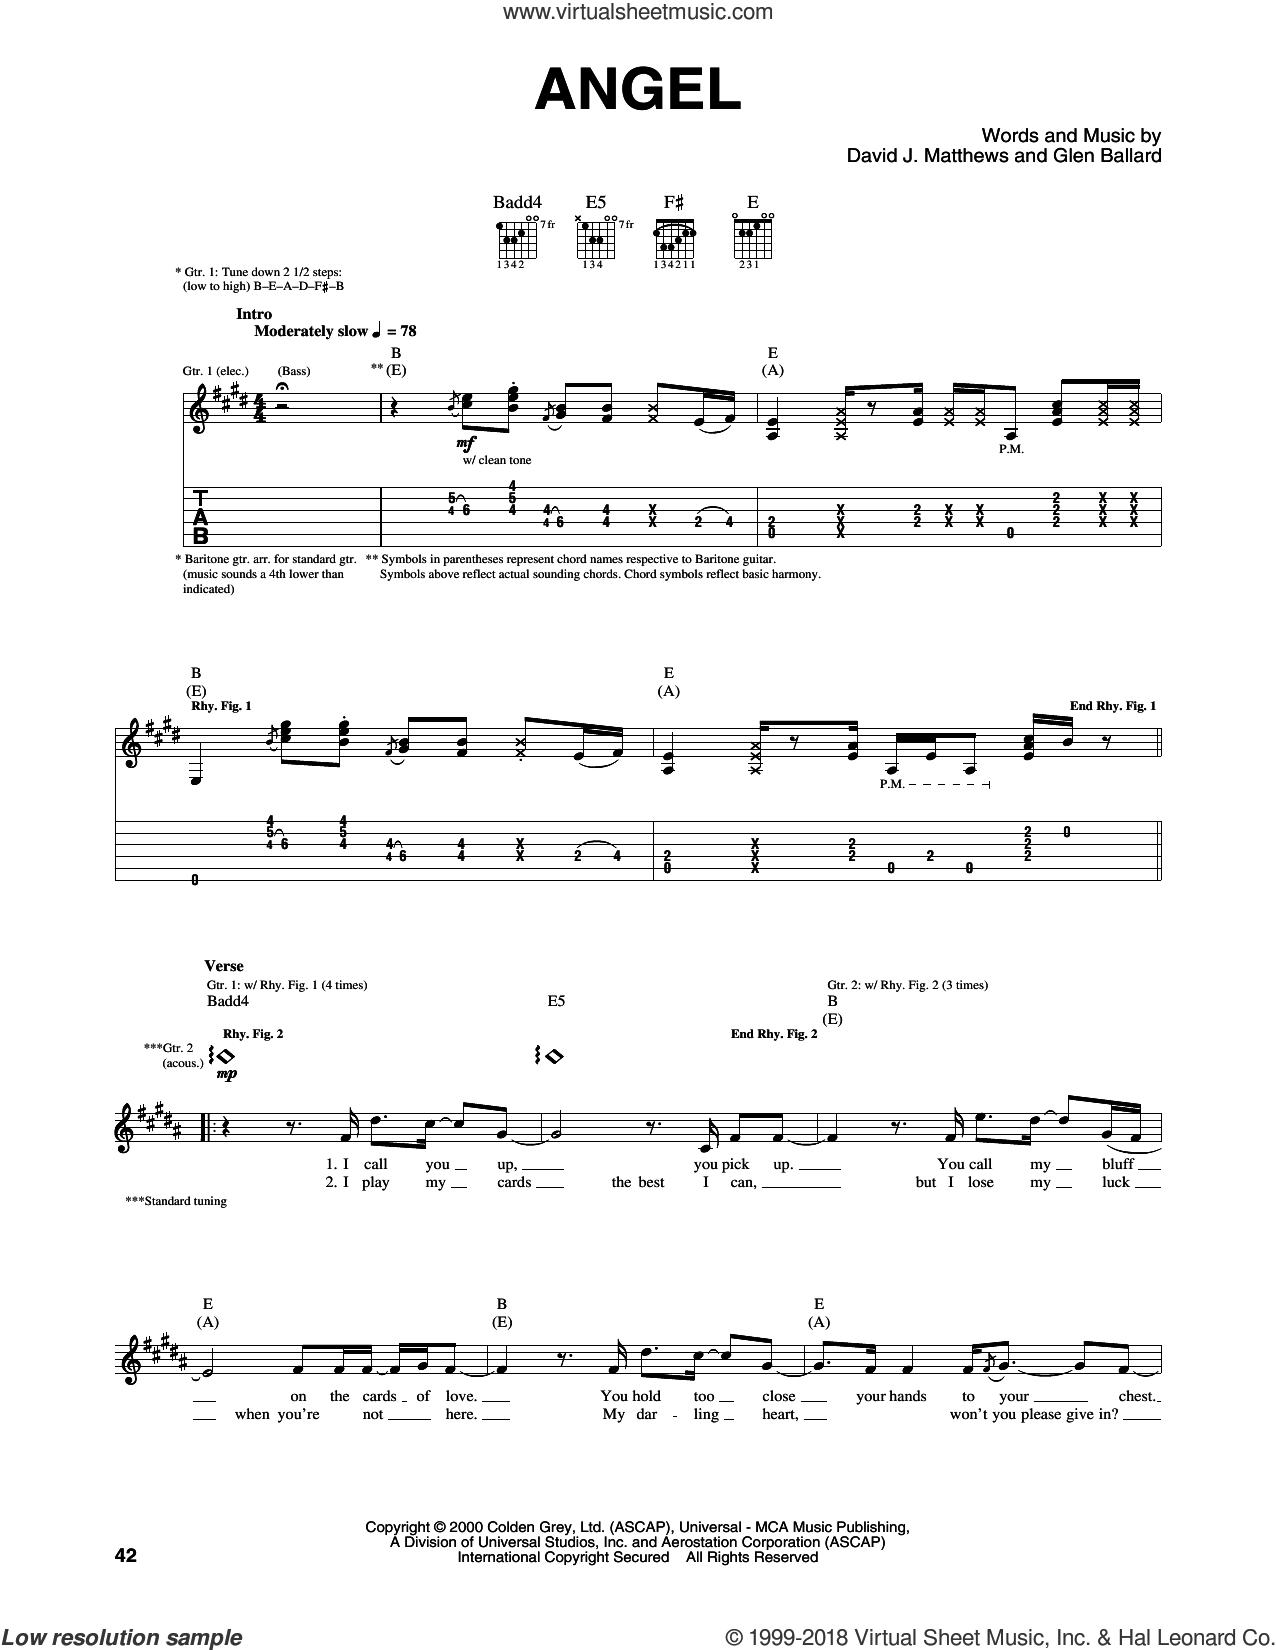 Angel sheet music for guitar (tablature) by Dave Matthews Band and Glen Ballard, intermediate skill level